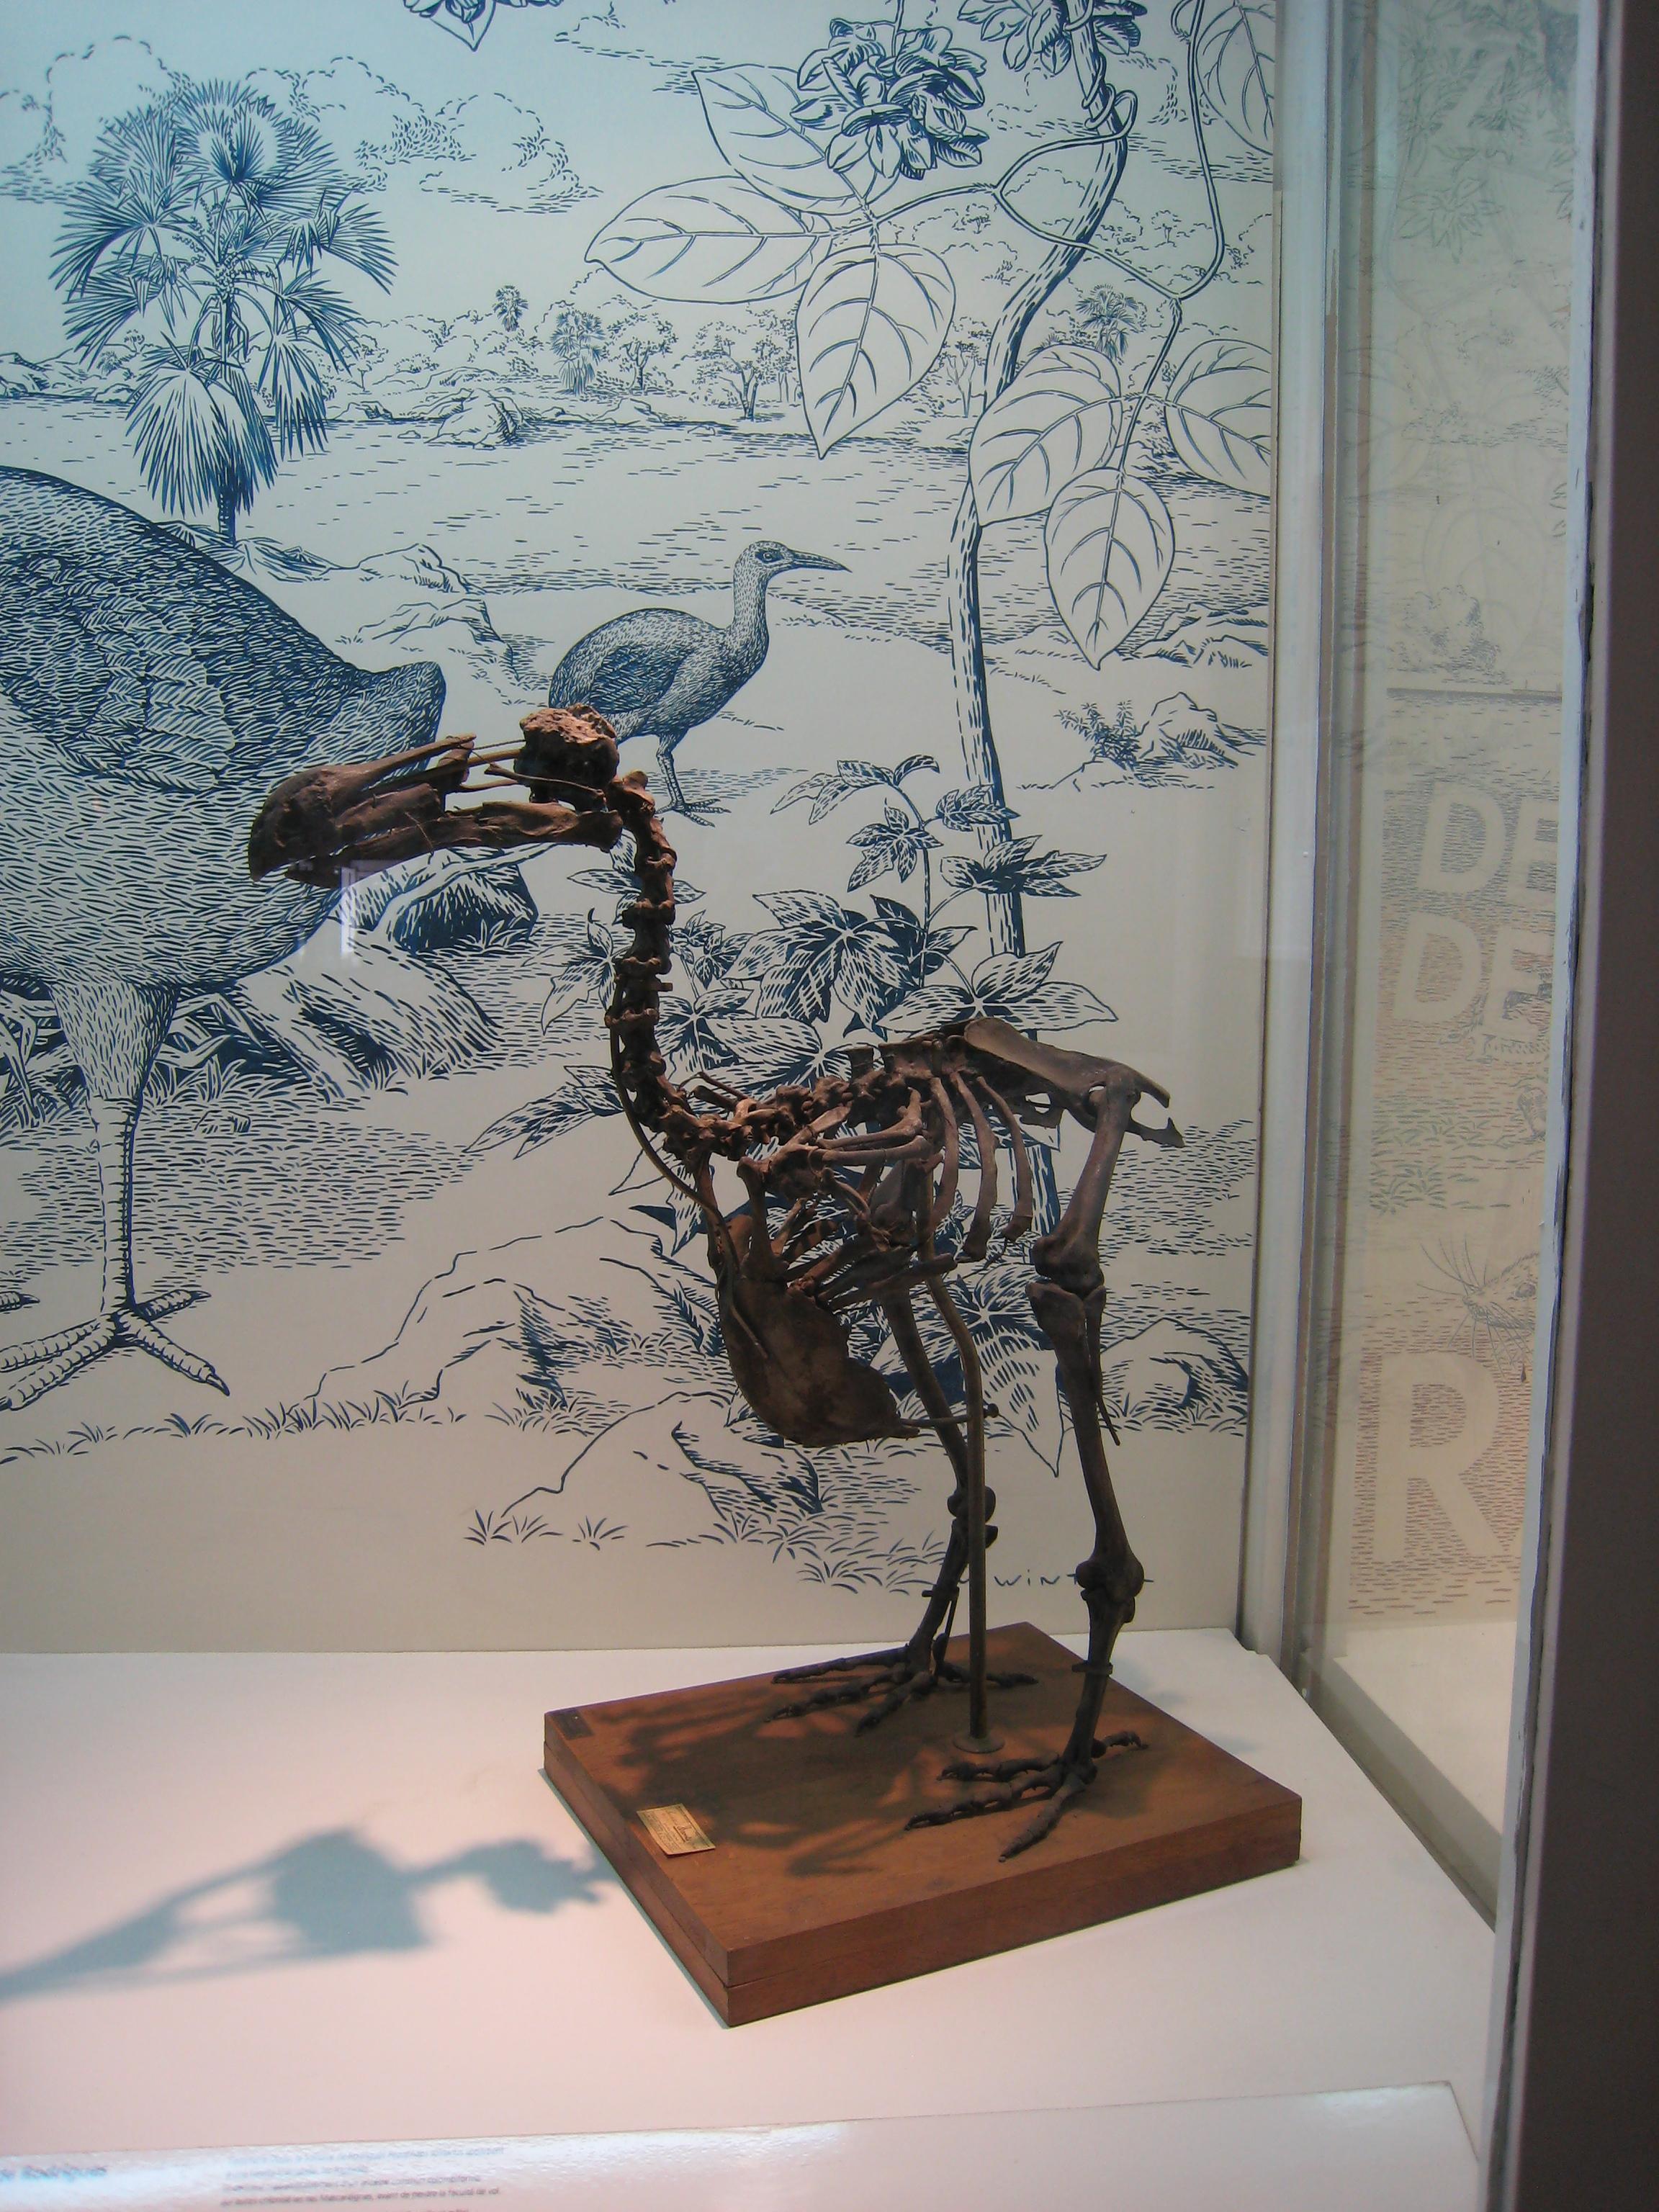 the skeleton of a Do-do bird